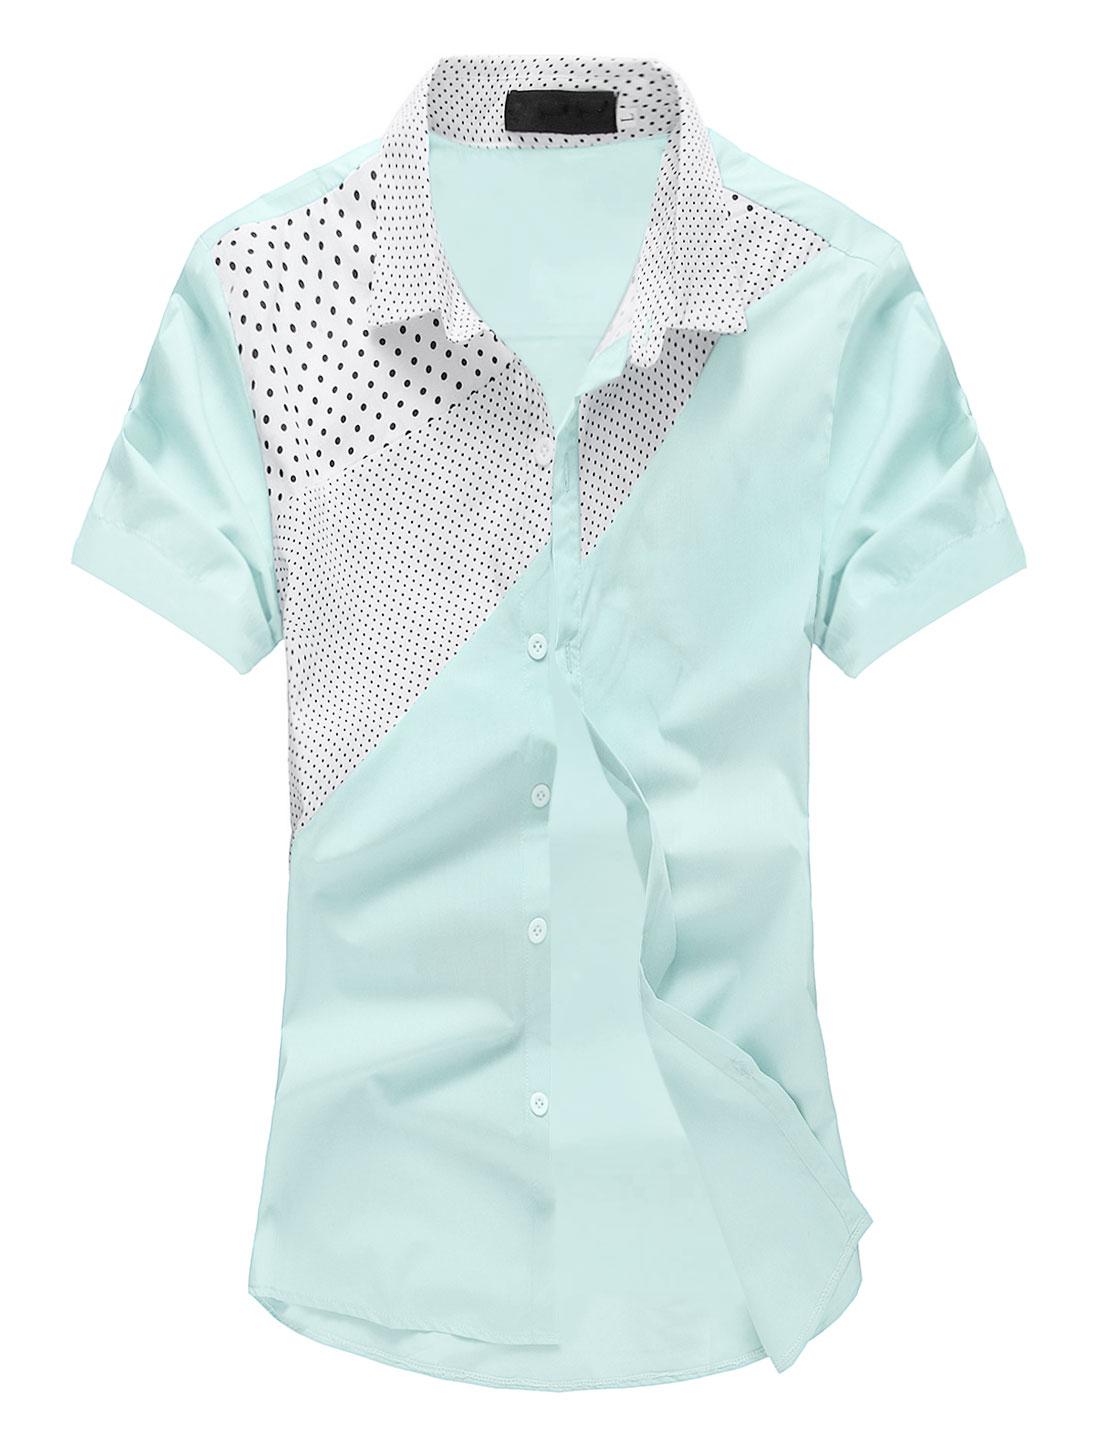 Men Dots Prints Short Sleeves Button Closed Casual Shirt Light Blue M